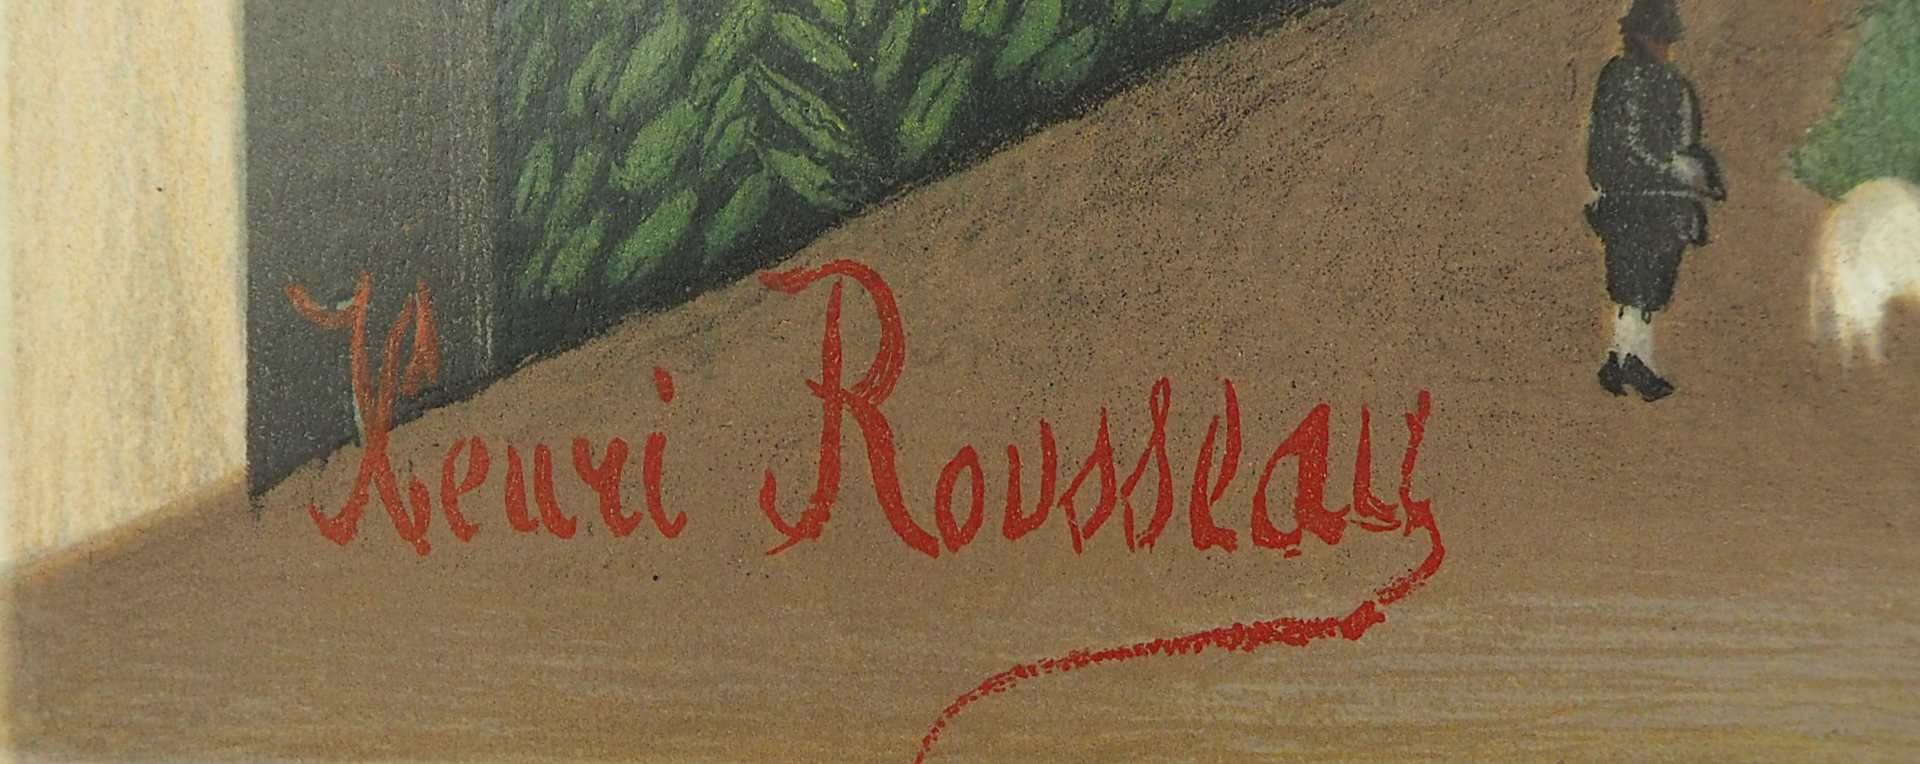 "1 Farblithographie ""La rue"" L.u. in Stein sign. Henri ROUSSEAU (wohl 1844-1910) aus: "" - Bild 2 aus 3"